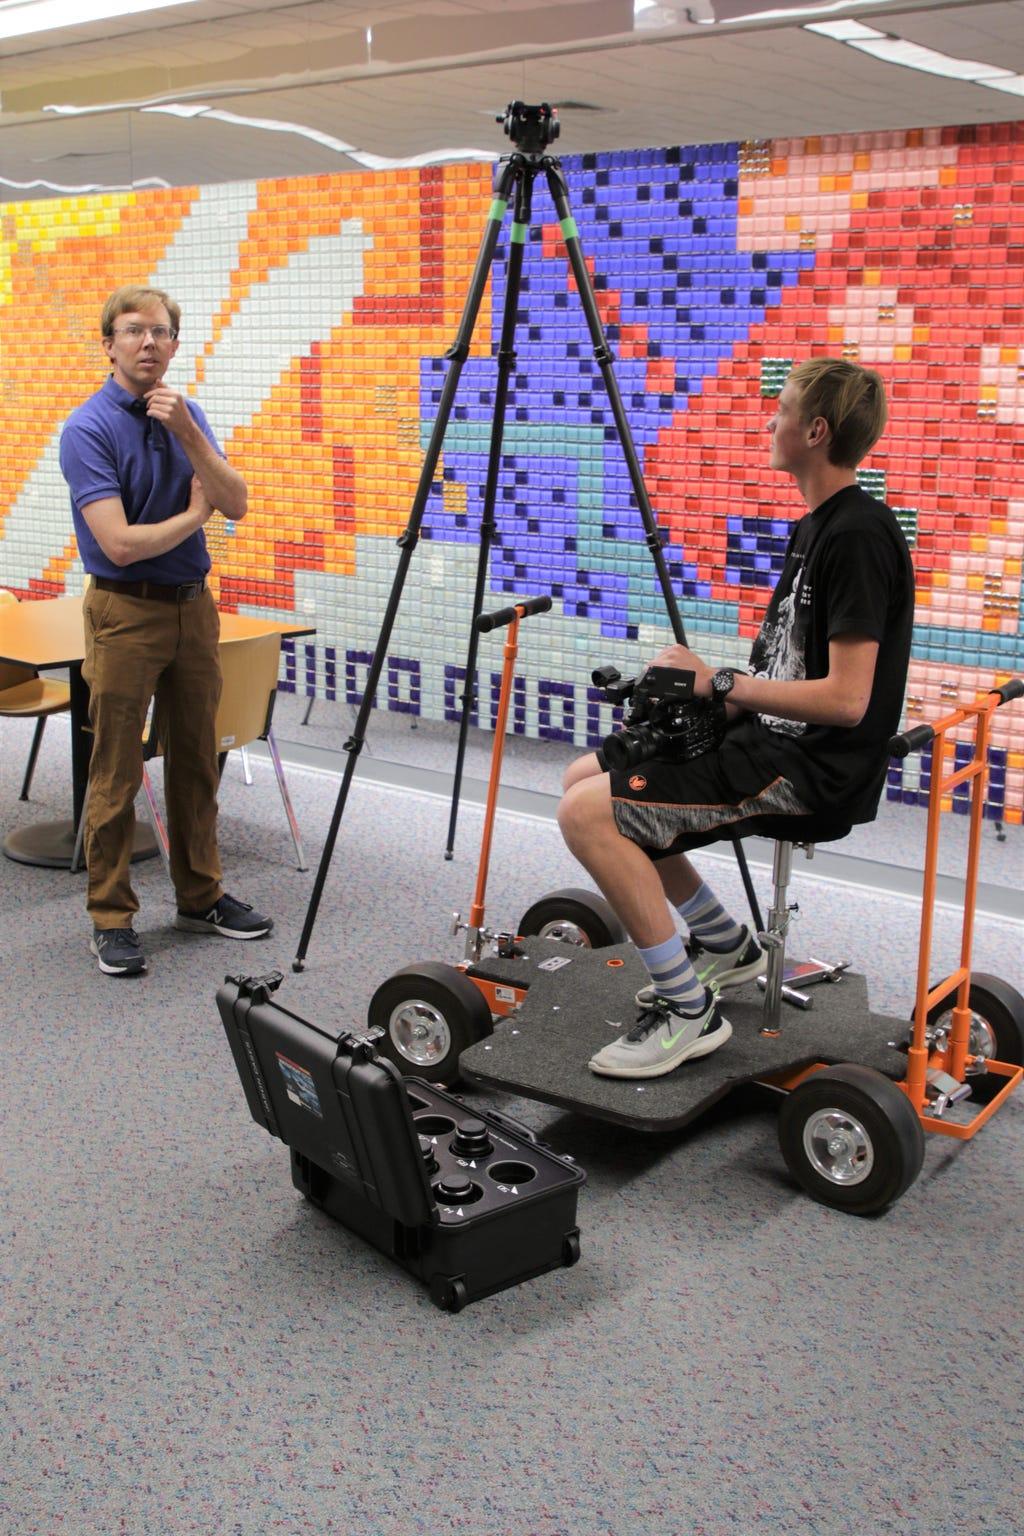 San Juan College professor Luke Renner, left, and student Carl Keller set up a camera tripod used by students in the digital arts program.